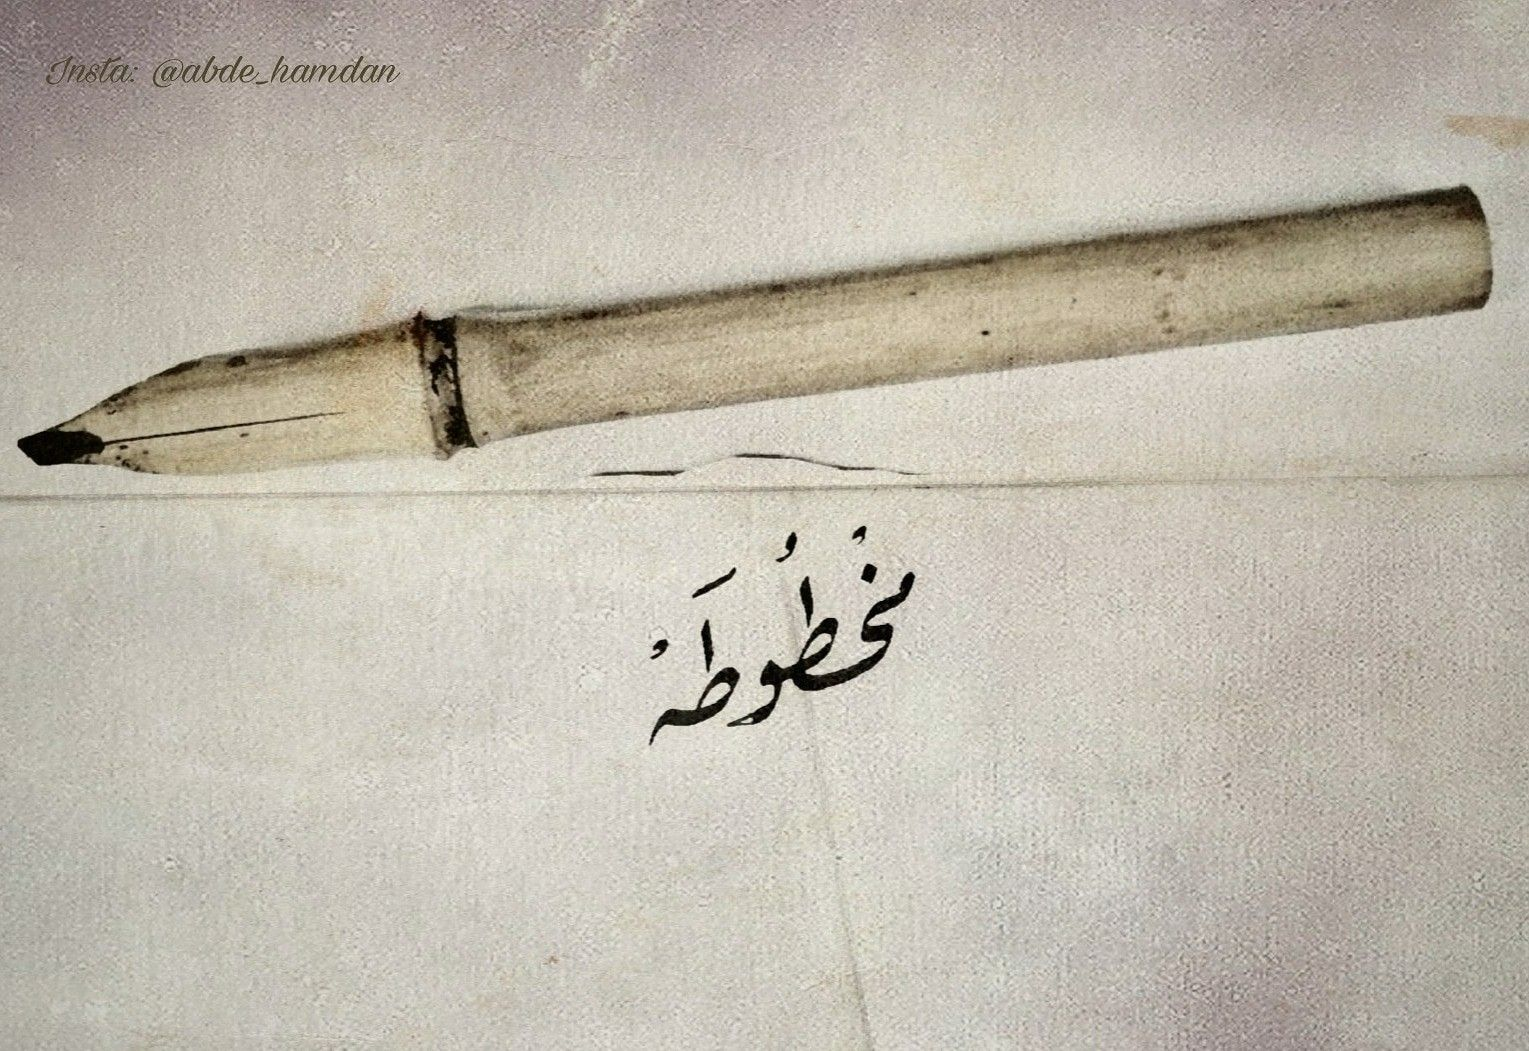 Www Facebook Com Makhtotah Insta Abde Hamdan خط صور خلفيات كلمات فن قصيد تصويري تصميمي تصميم رقعة رمزيات خواطر Geometric Tattoo Geometric Tattoos